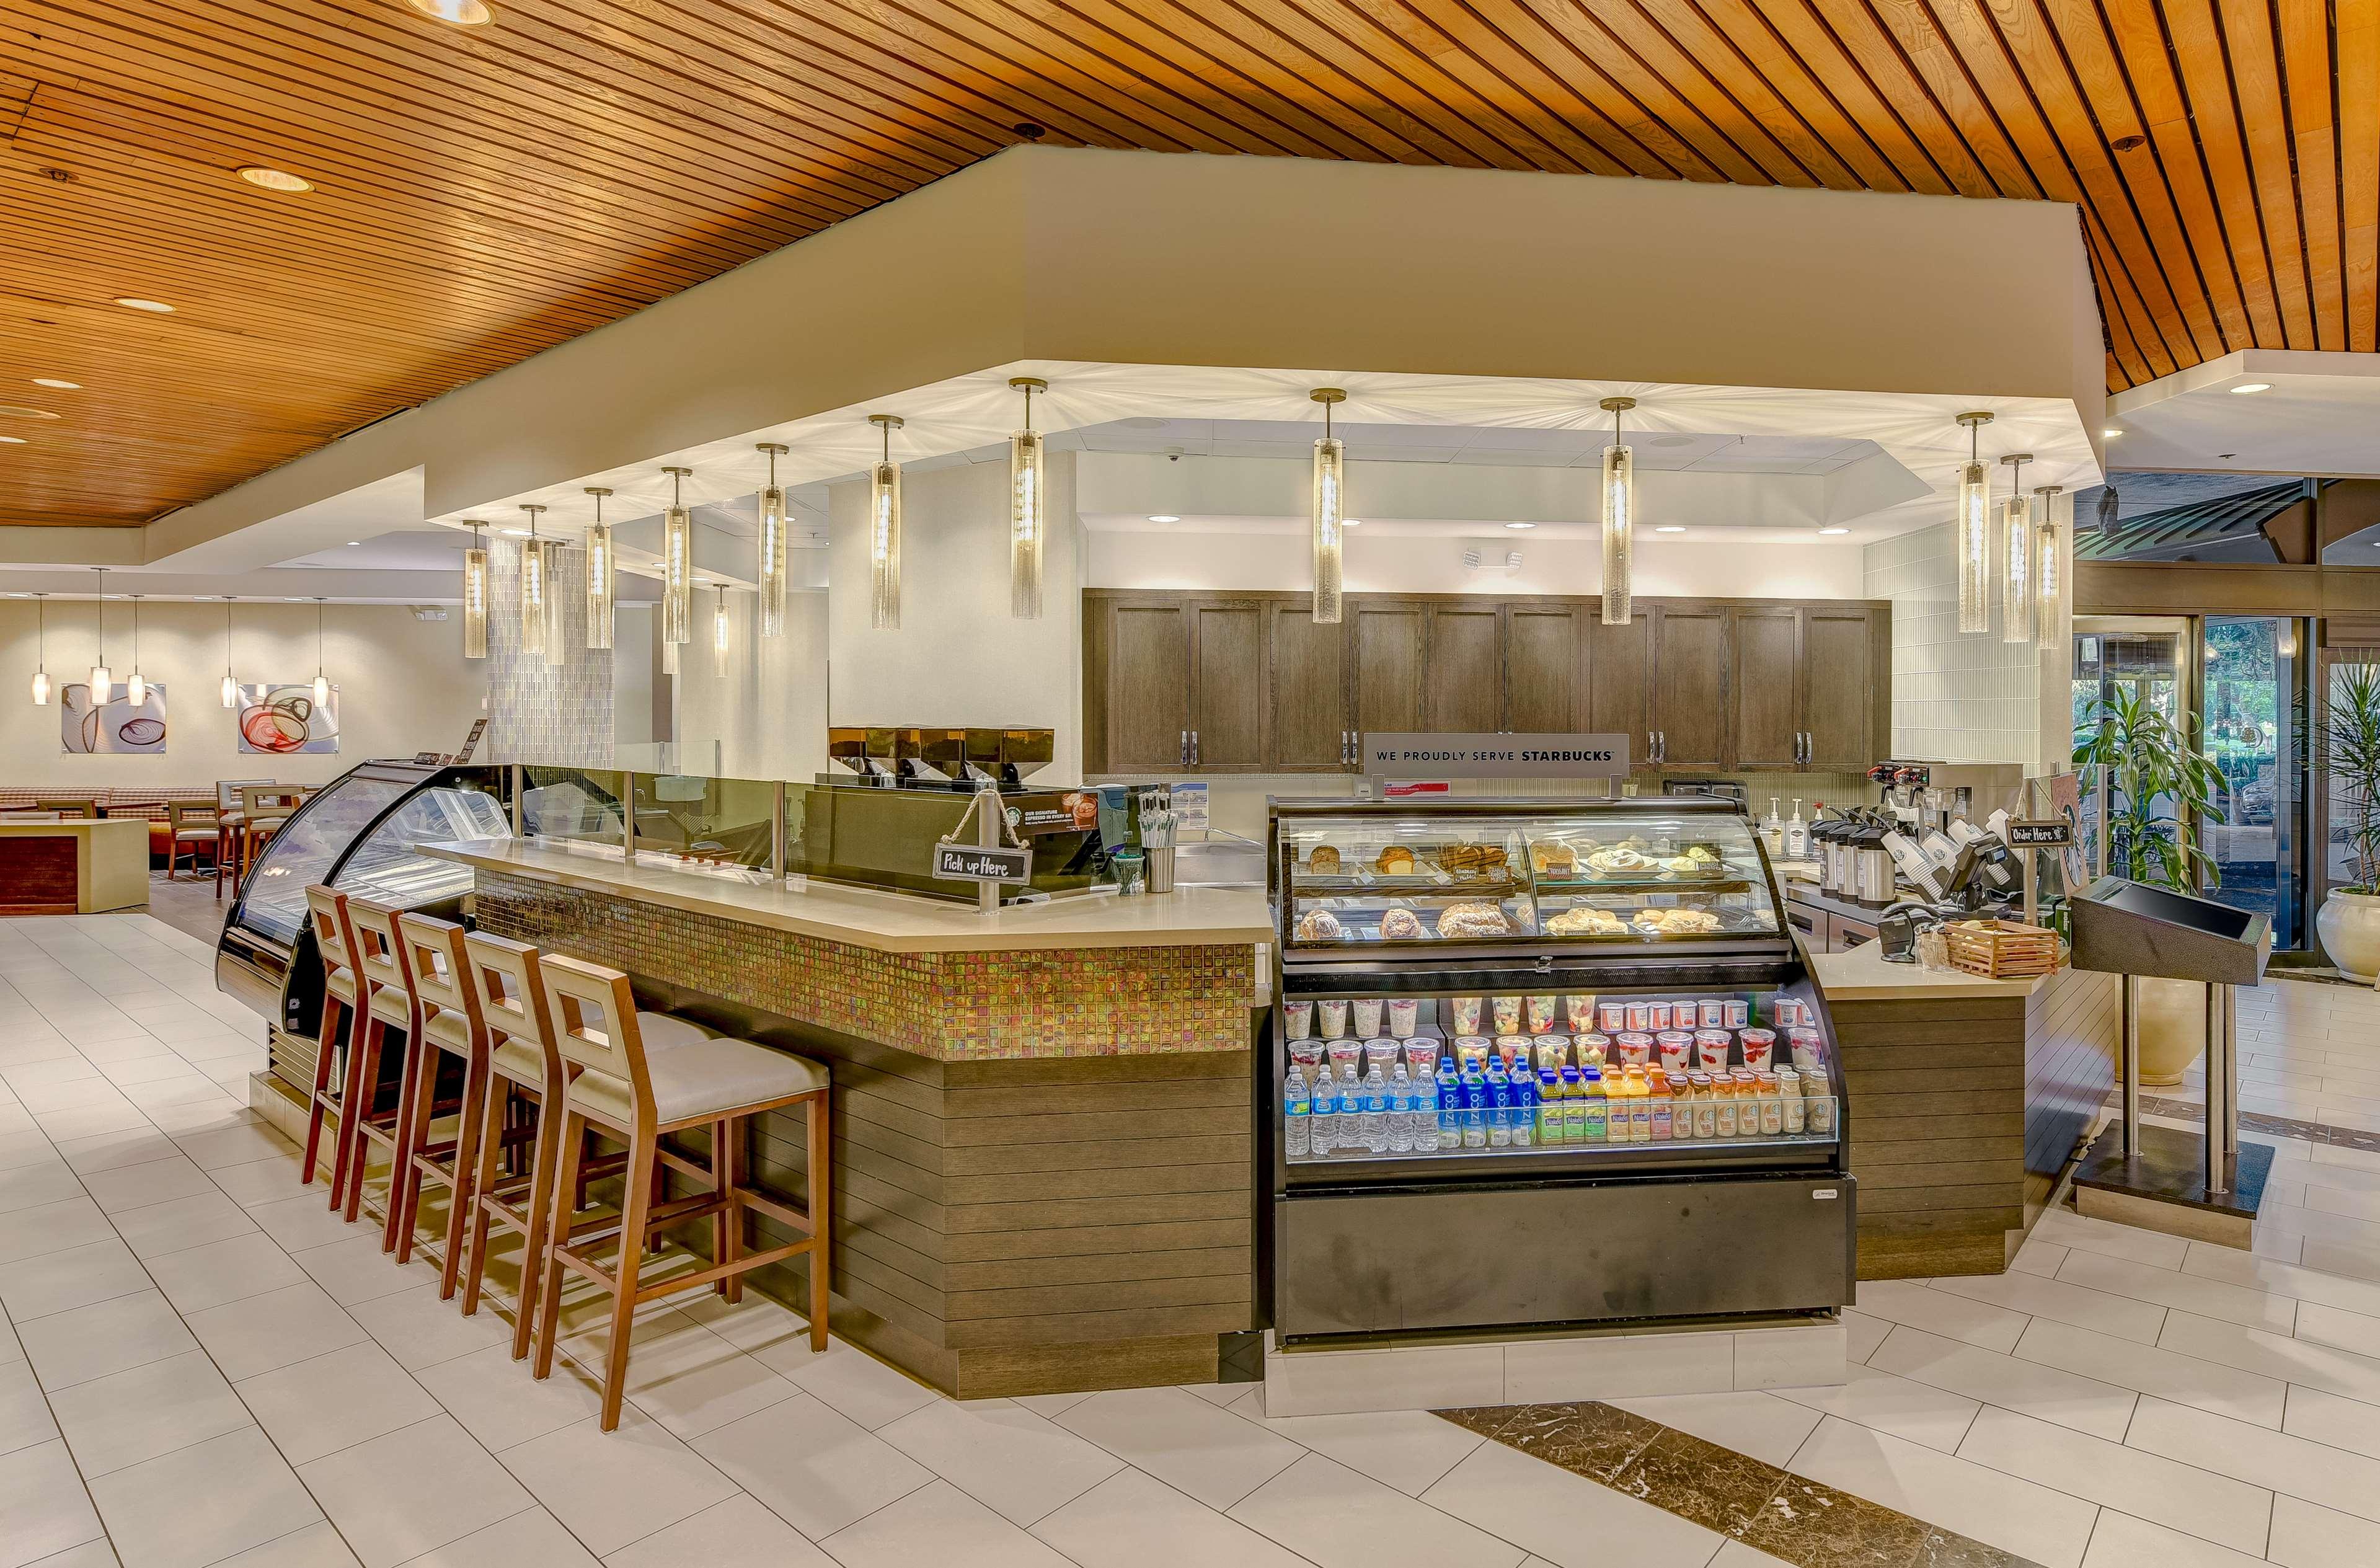 DoubleTree by Hilton Hotel Anaheim - Orange County image 31